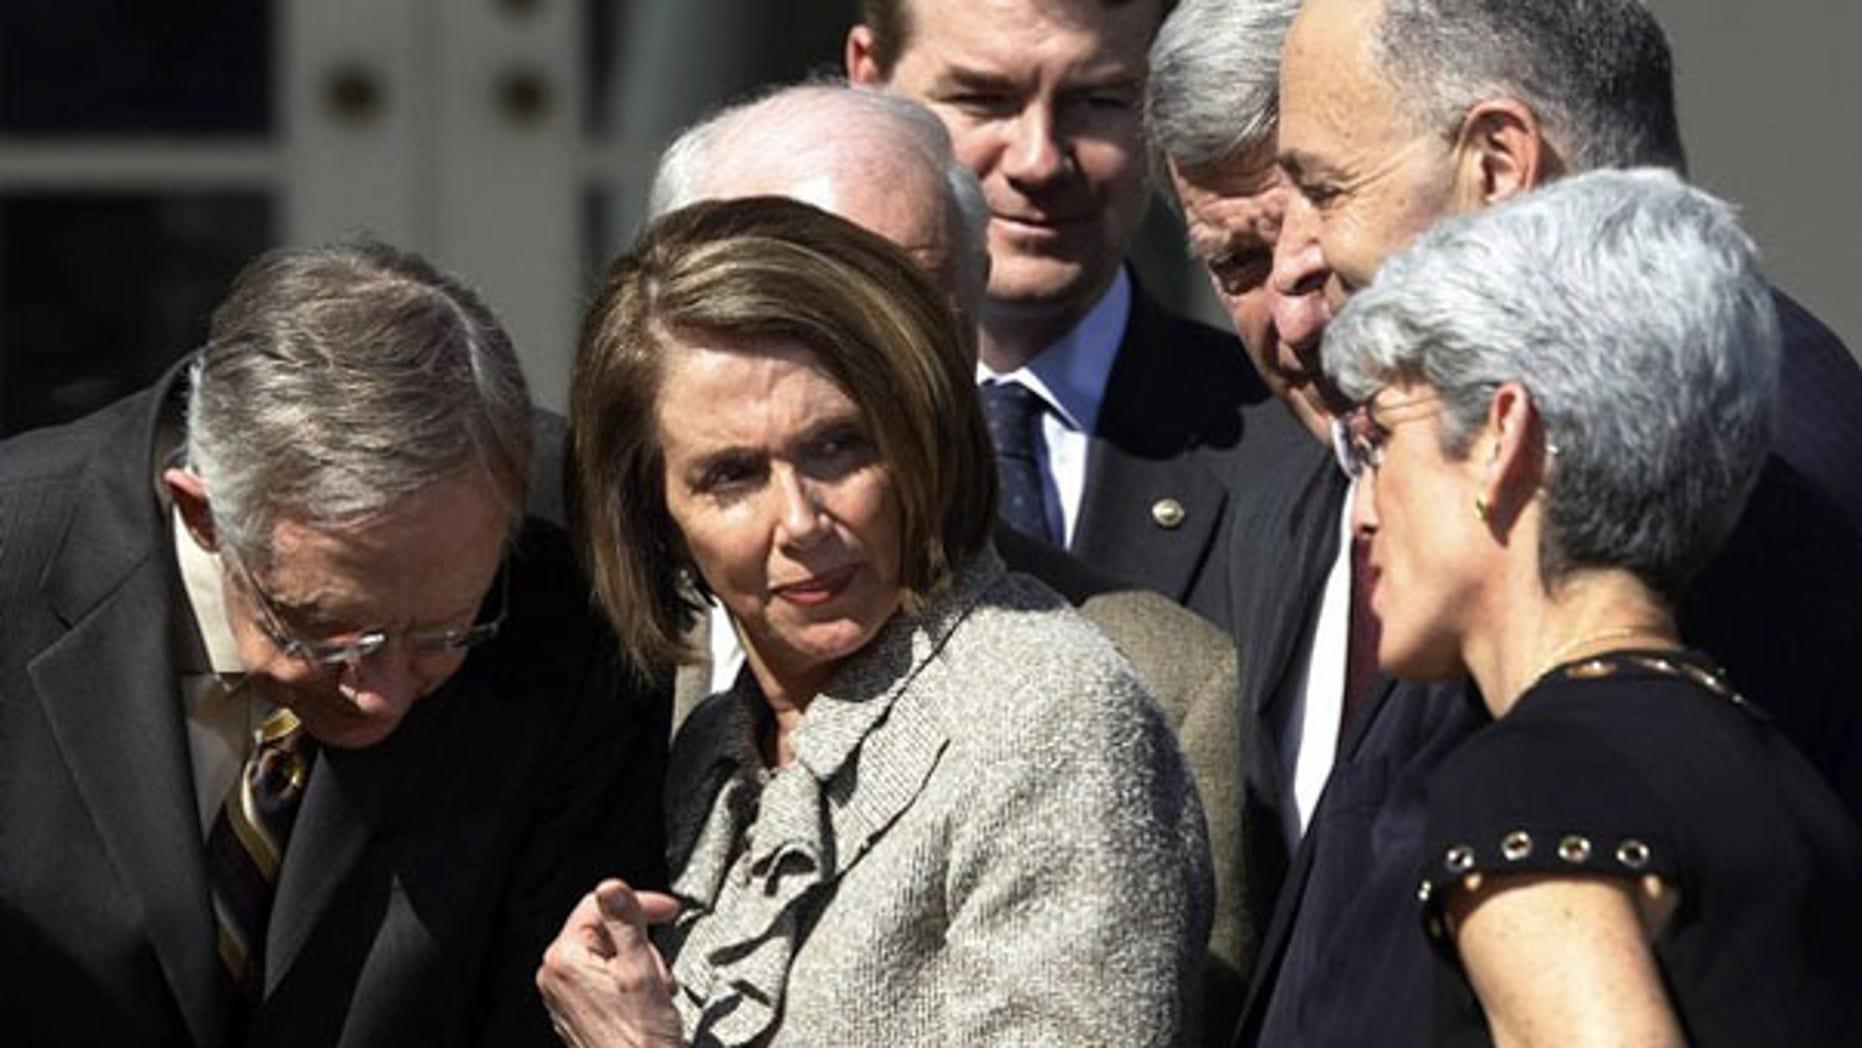 House Speaker Nancy Pelosi confers with Senate Majority Leader Harry Reid and Sen. Chuck Schumer in the Rose Garden March 18. (Reuters Photo)